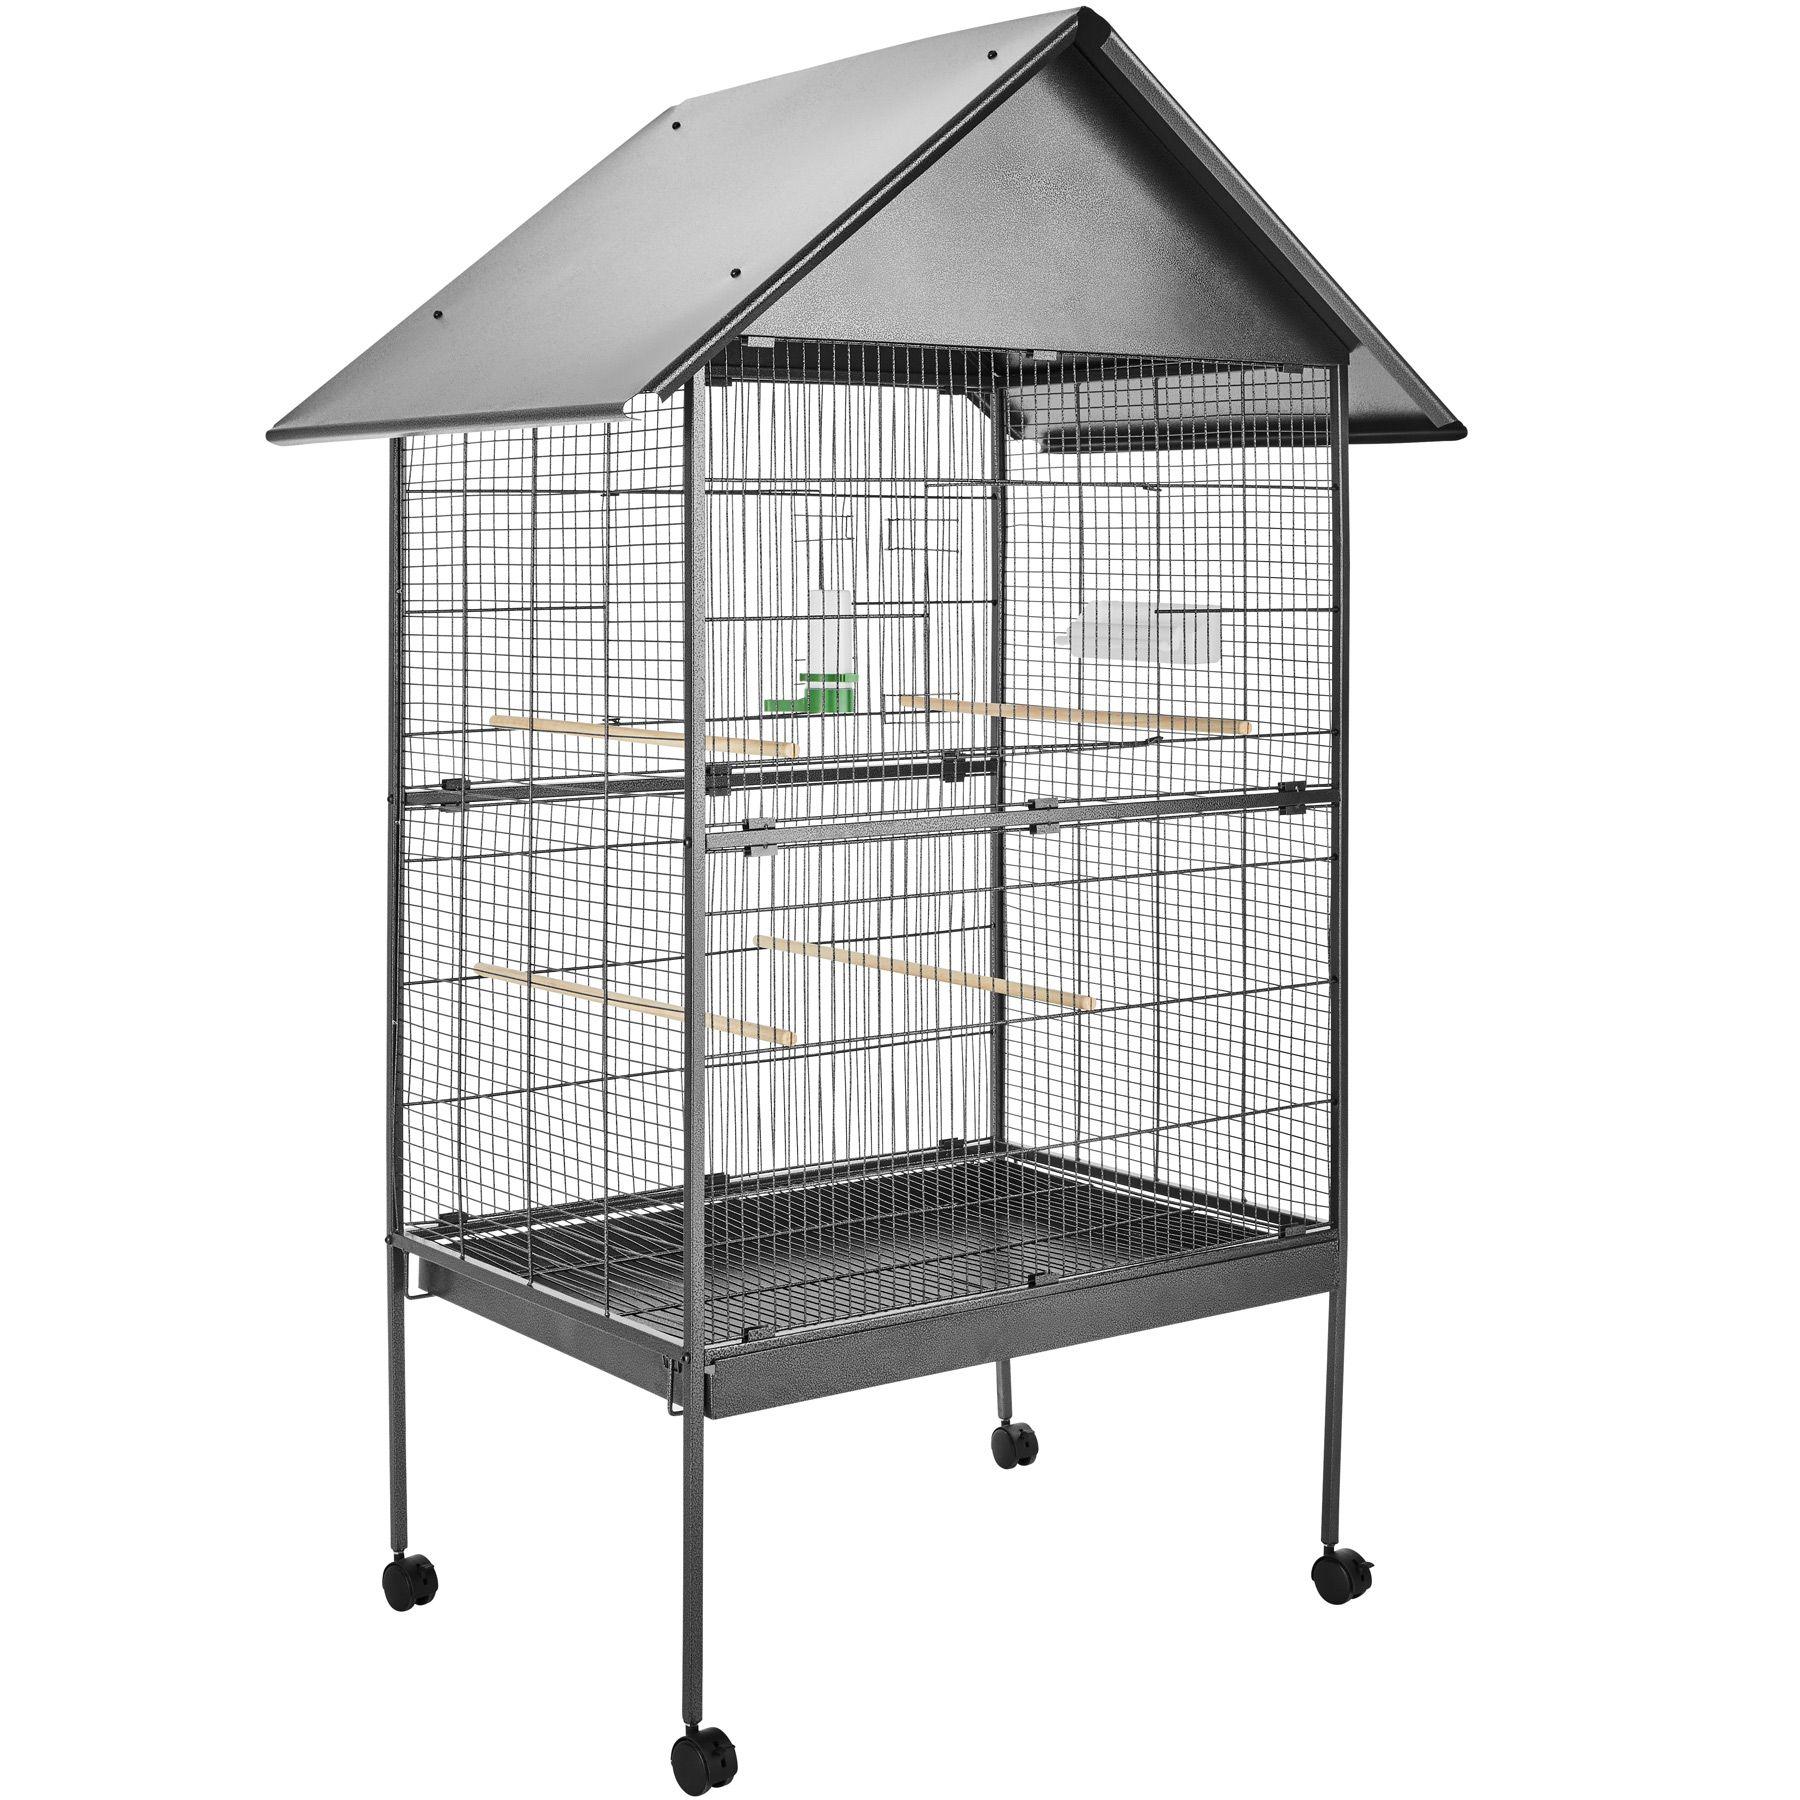 Large bird aviary cage parrot budgerigar canary metal birds house ...